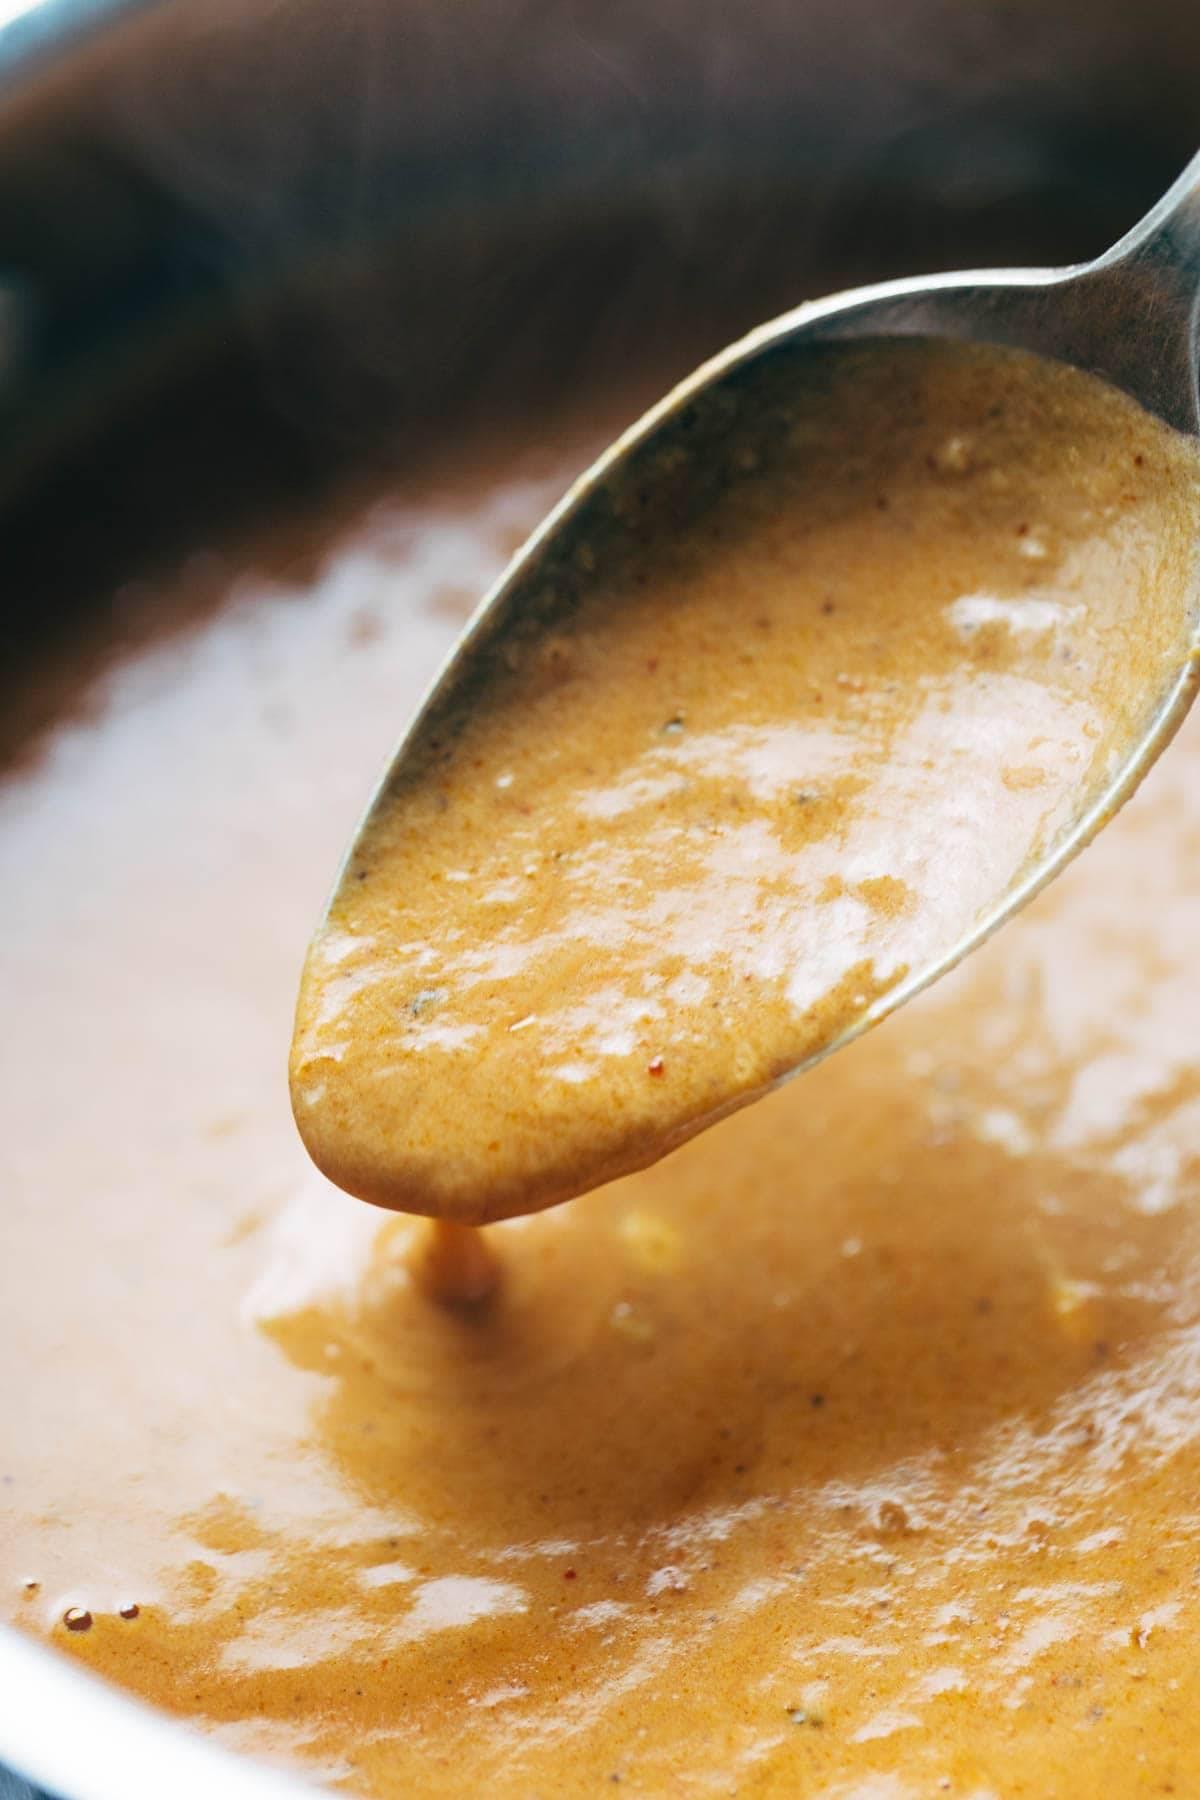 30 Minute Masala Sauce! made with onions, garlic, turmeric, cumin, chili powder, lemon juice, cilantro, tomato puree, and coconut milk. Perfect sauce for veggie or chicken tikka masala! Vegetarian / Vegan.  pinchofyum.com